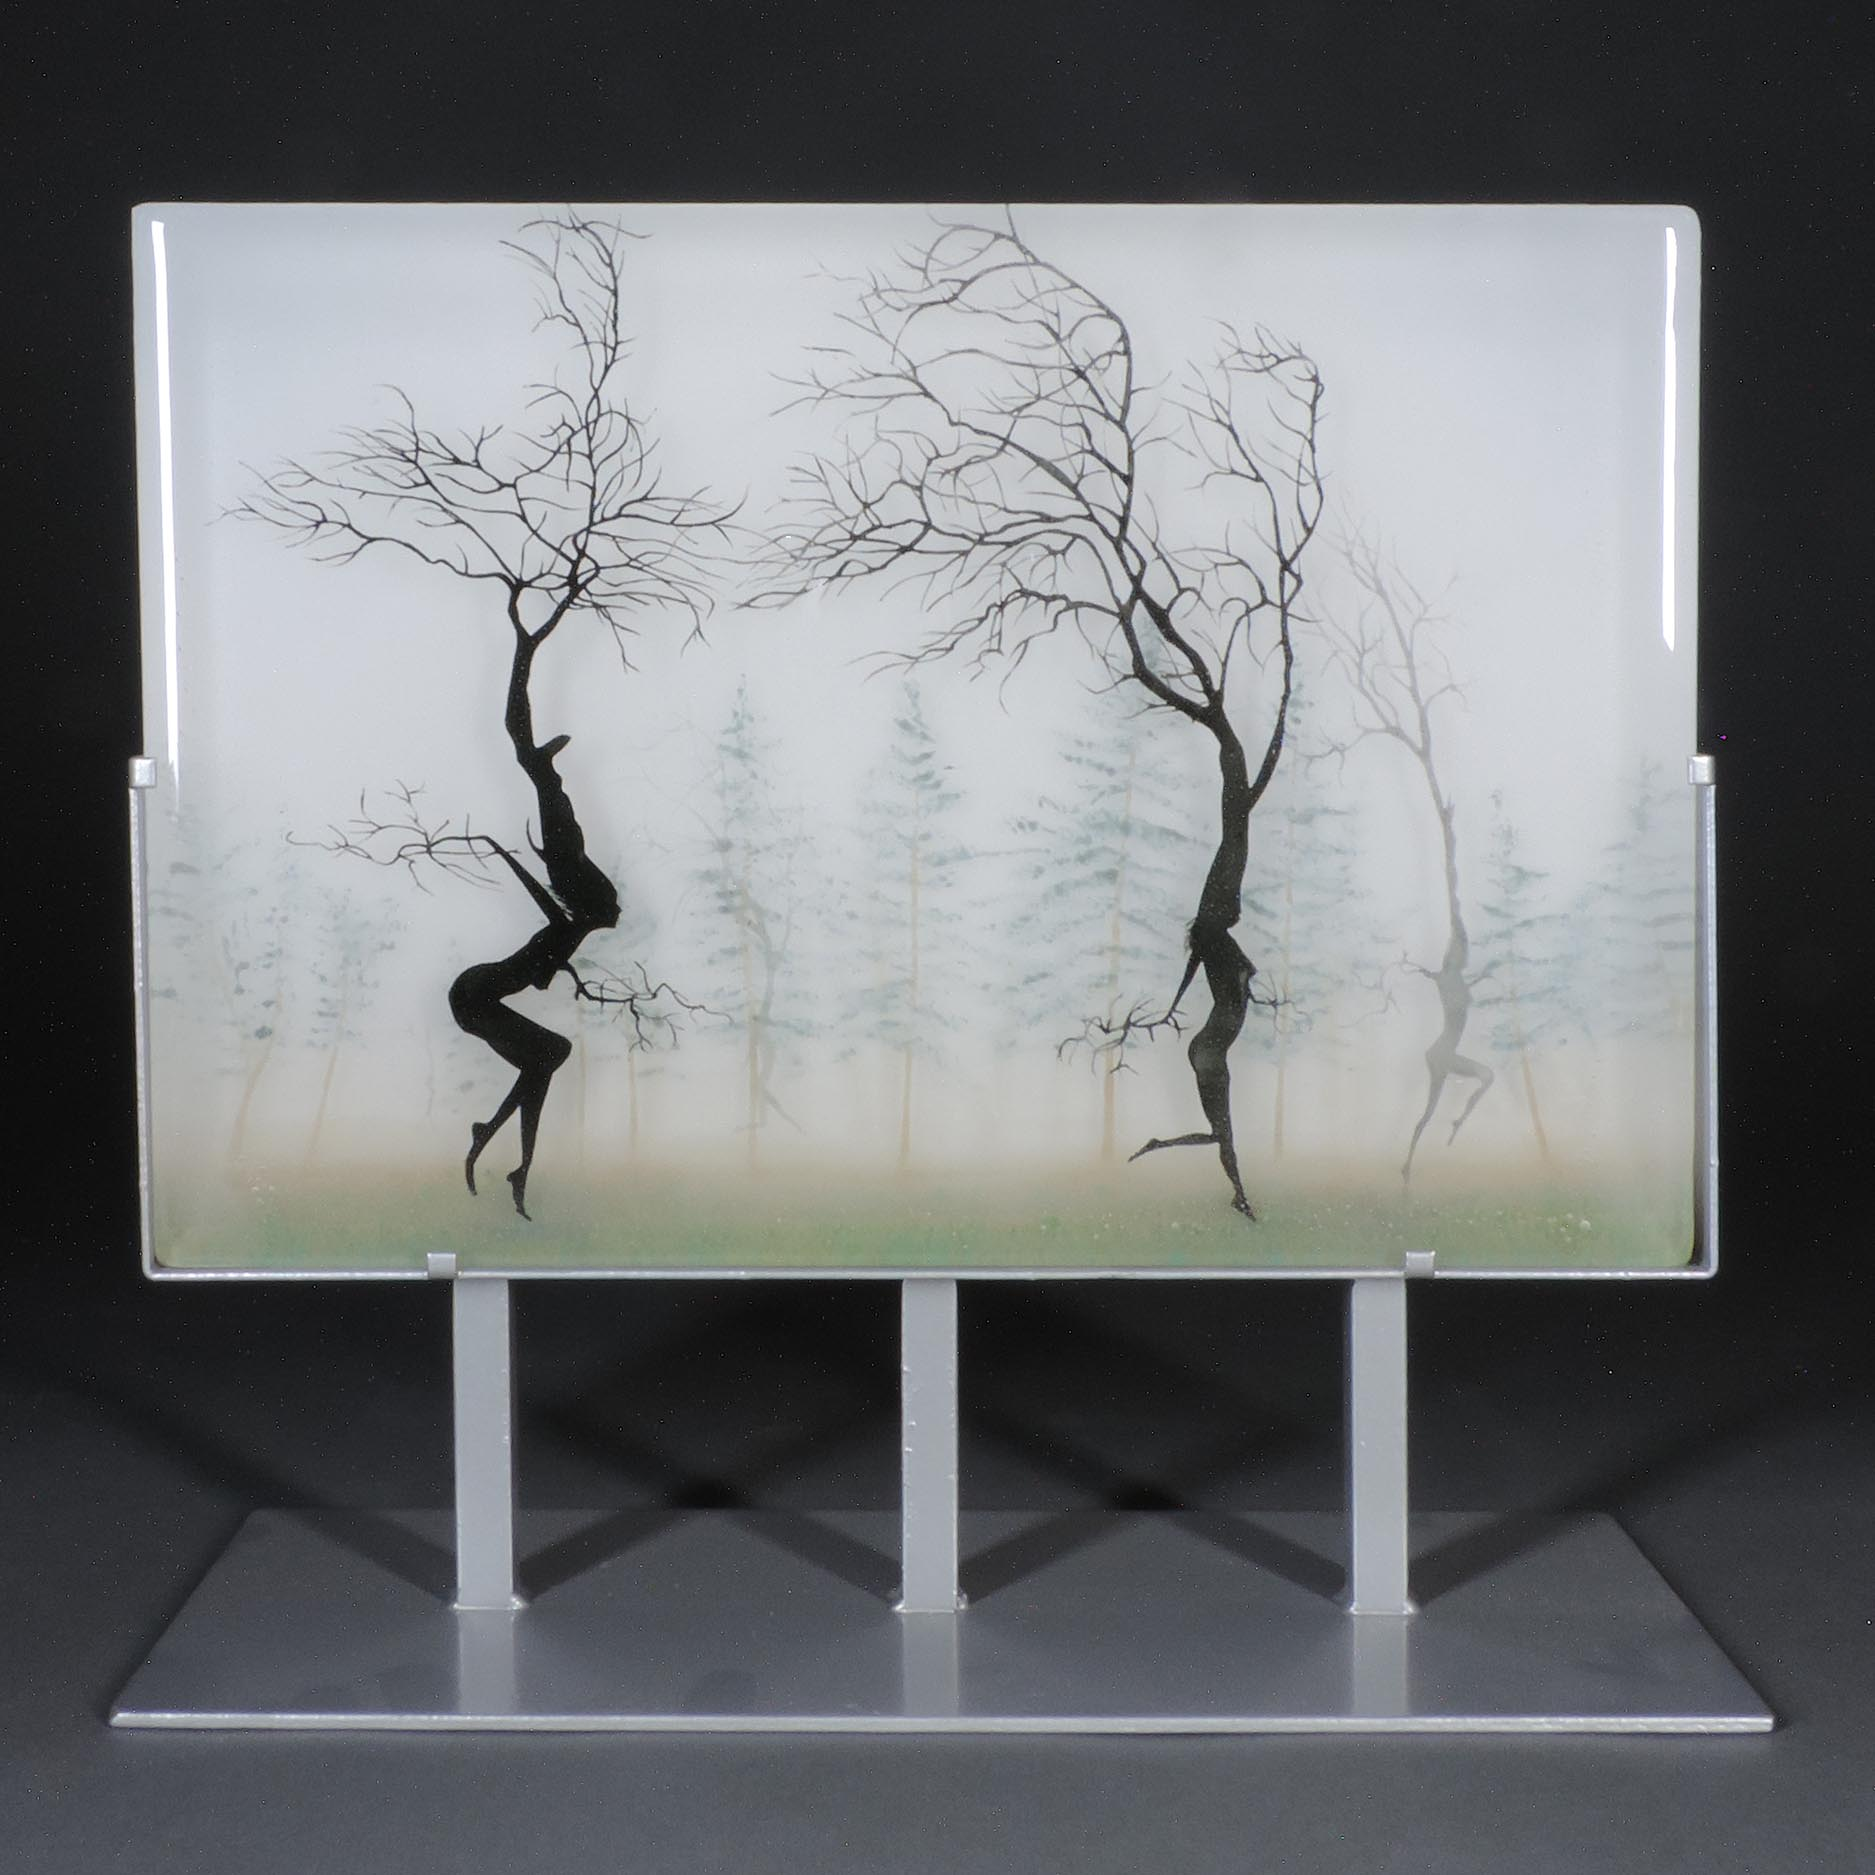 Paul Messink Dancers Mist Habatat Galleries Contemporary Fine Art